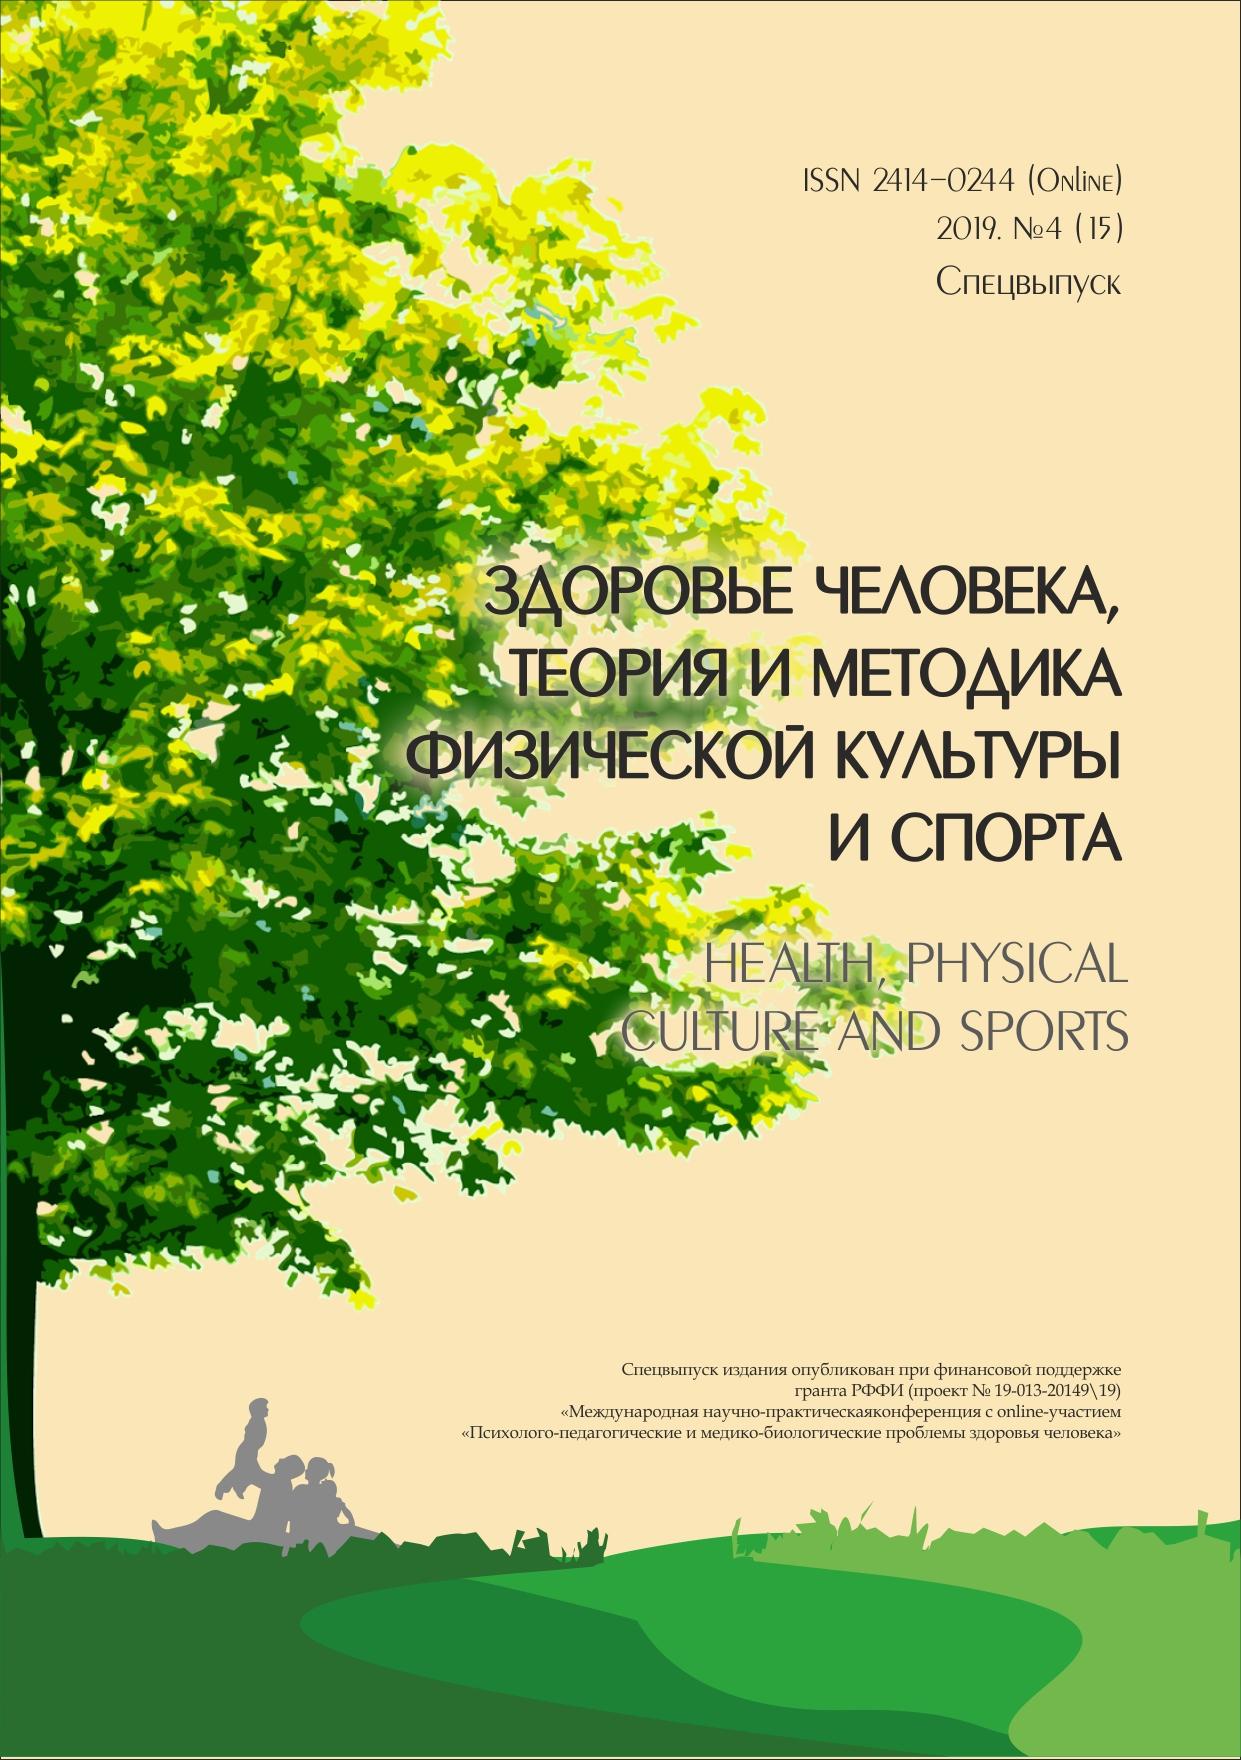 Спецвыпуск  журнала на средства гранта РФФИ, проект  № 19-013-20149\19